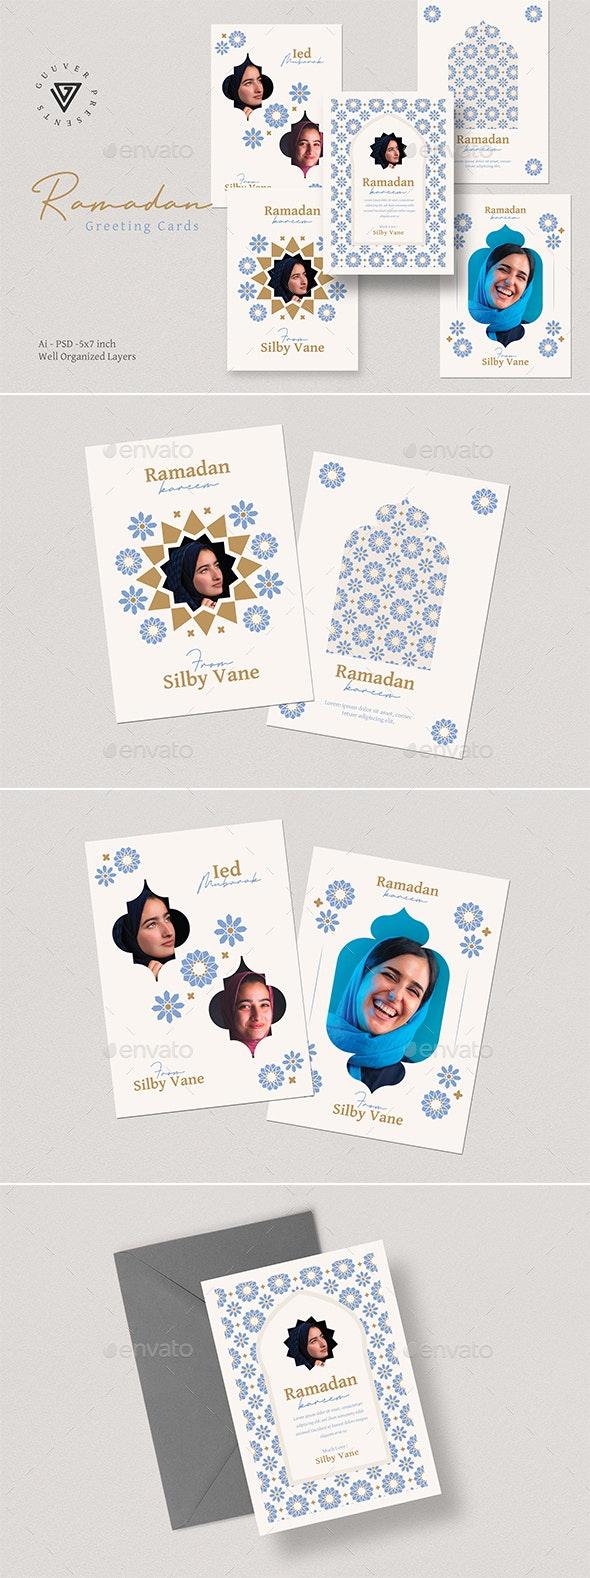 Ramadan Kareem Greeting Cards - Cards & Invites Print Templates